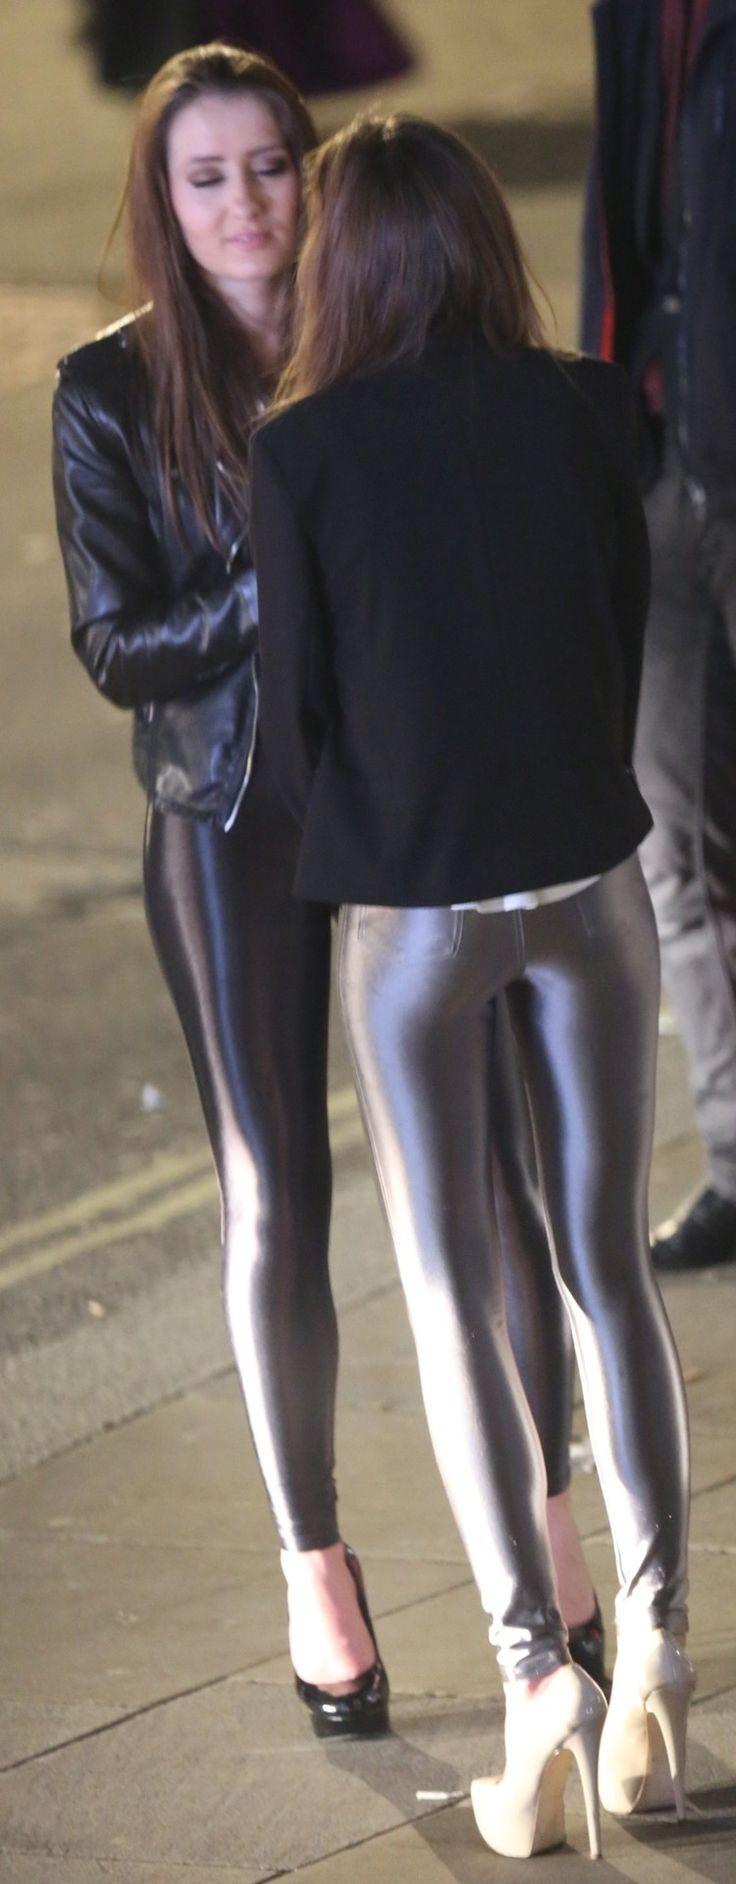 Women in tight pants pics